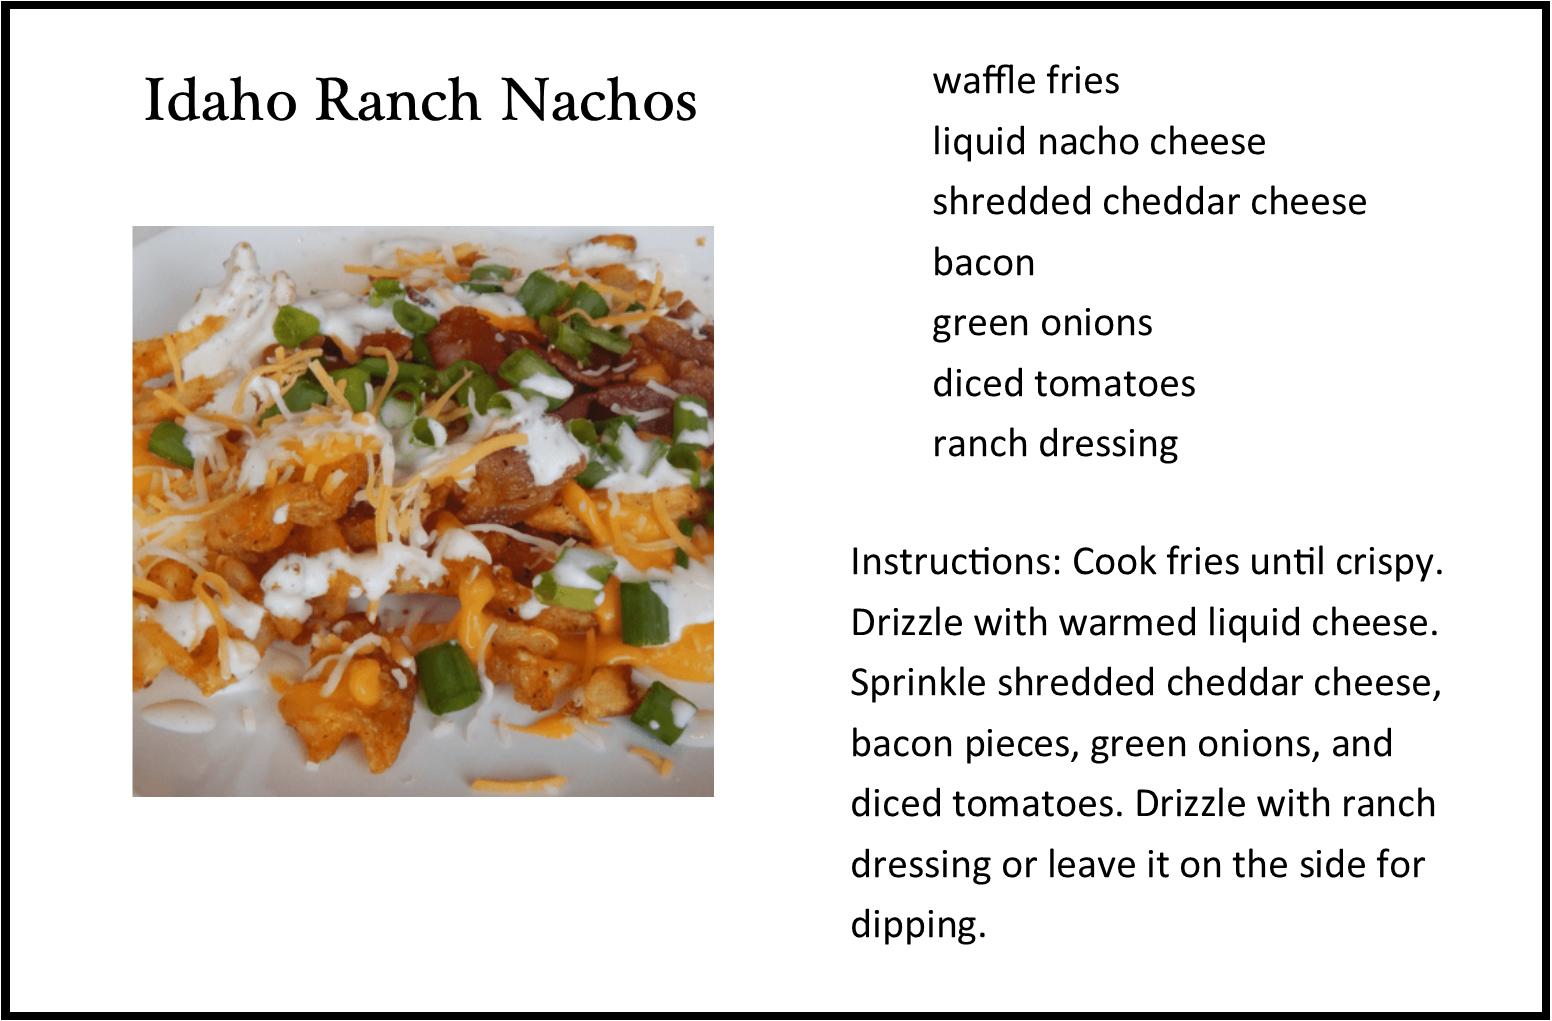 Idaho Ranch Nachos